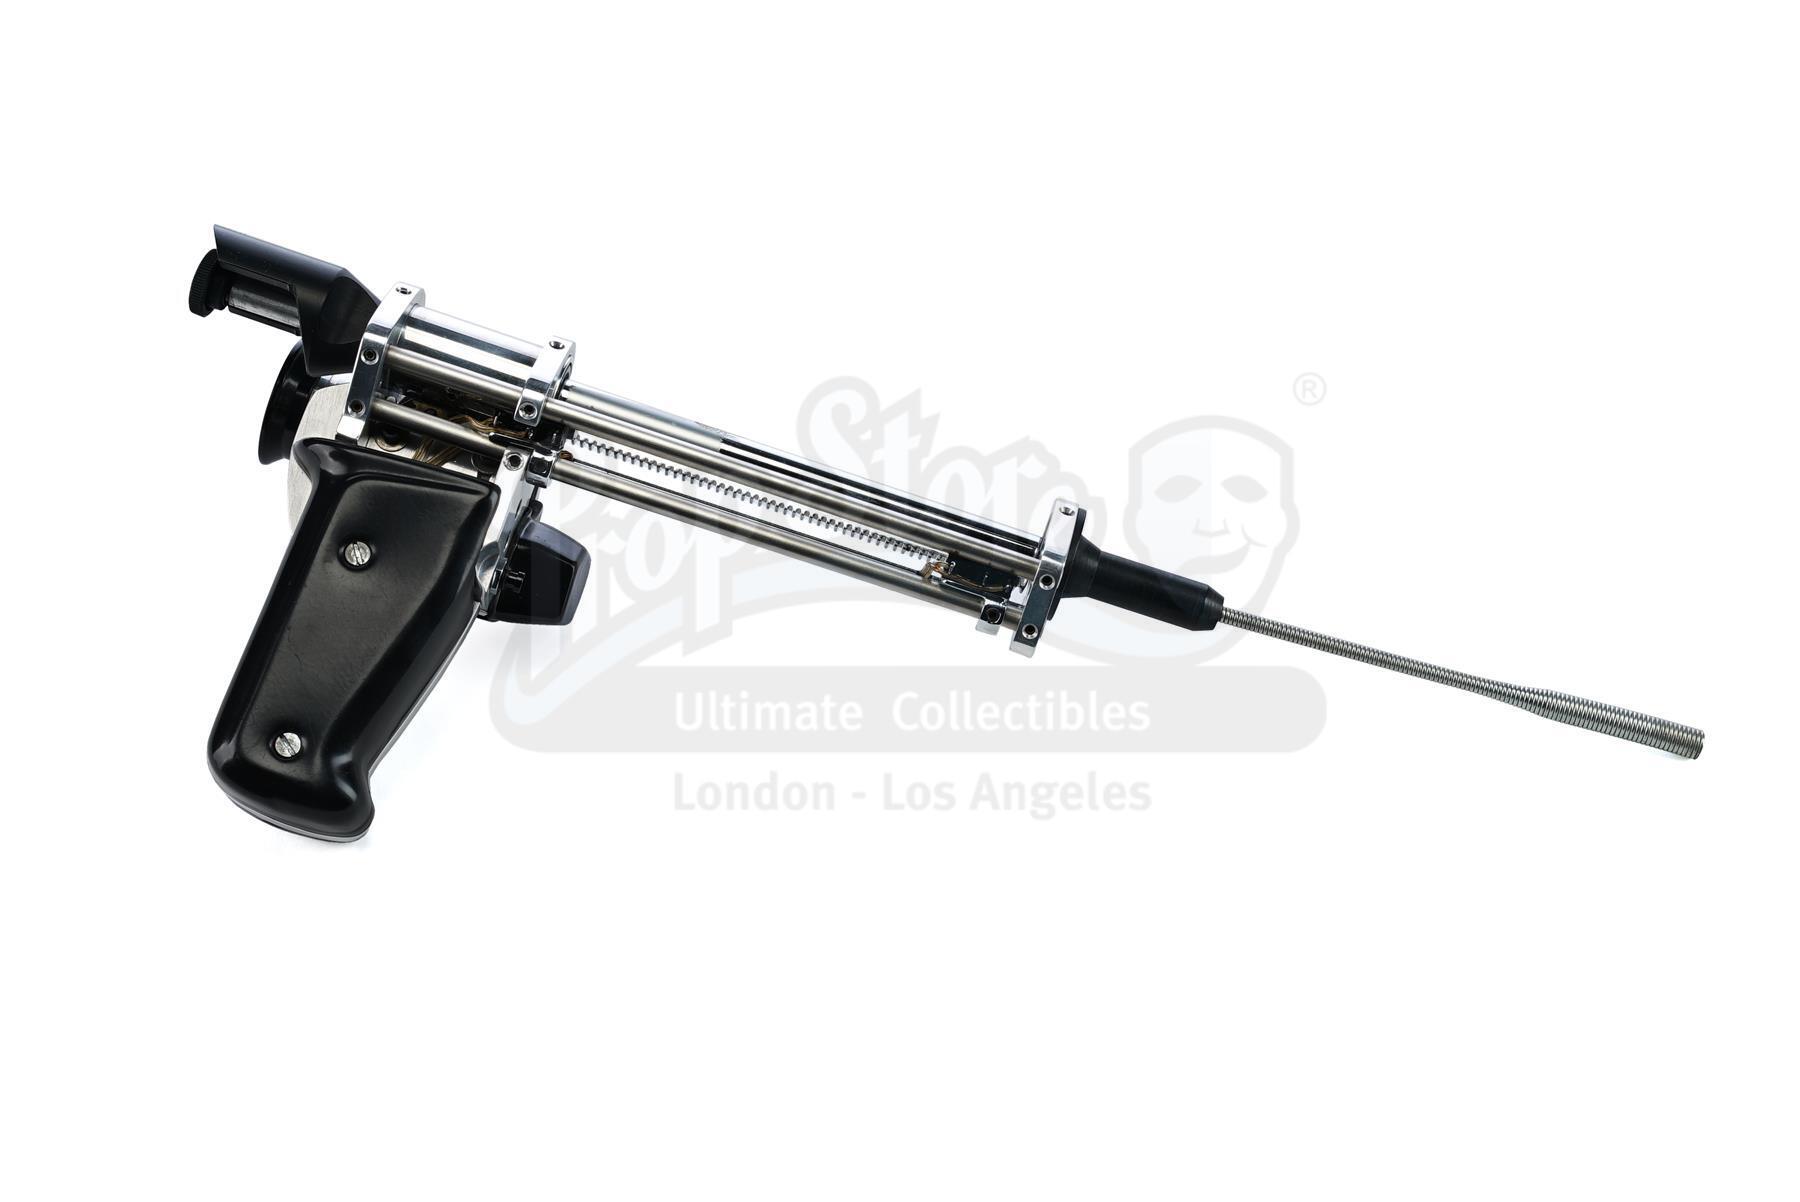 Lot # 390: TOTAL RECALL - Douglas Quaid's (Arnold Schwarzenegger) Tracker Extractor Tool